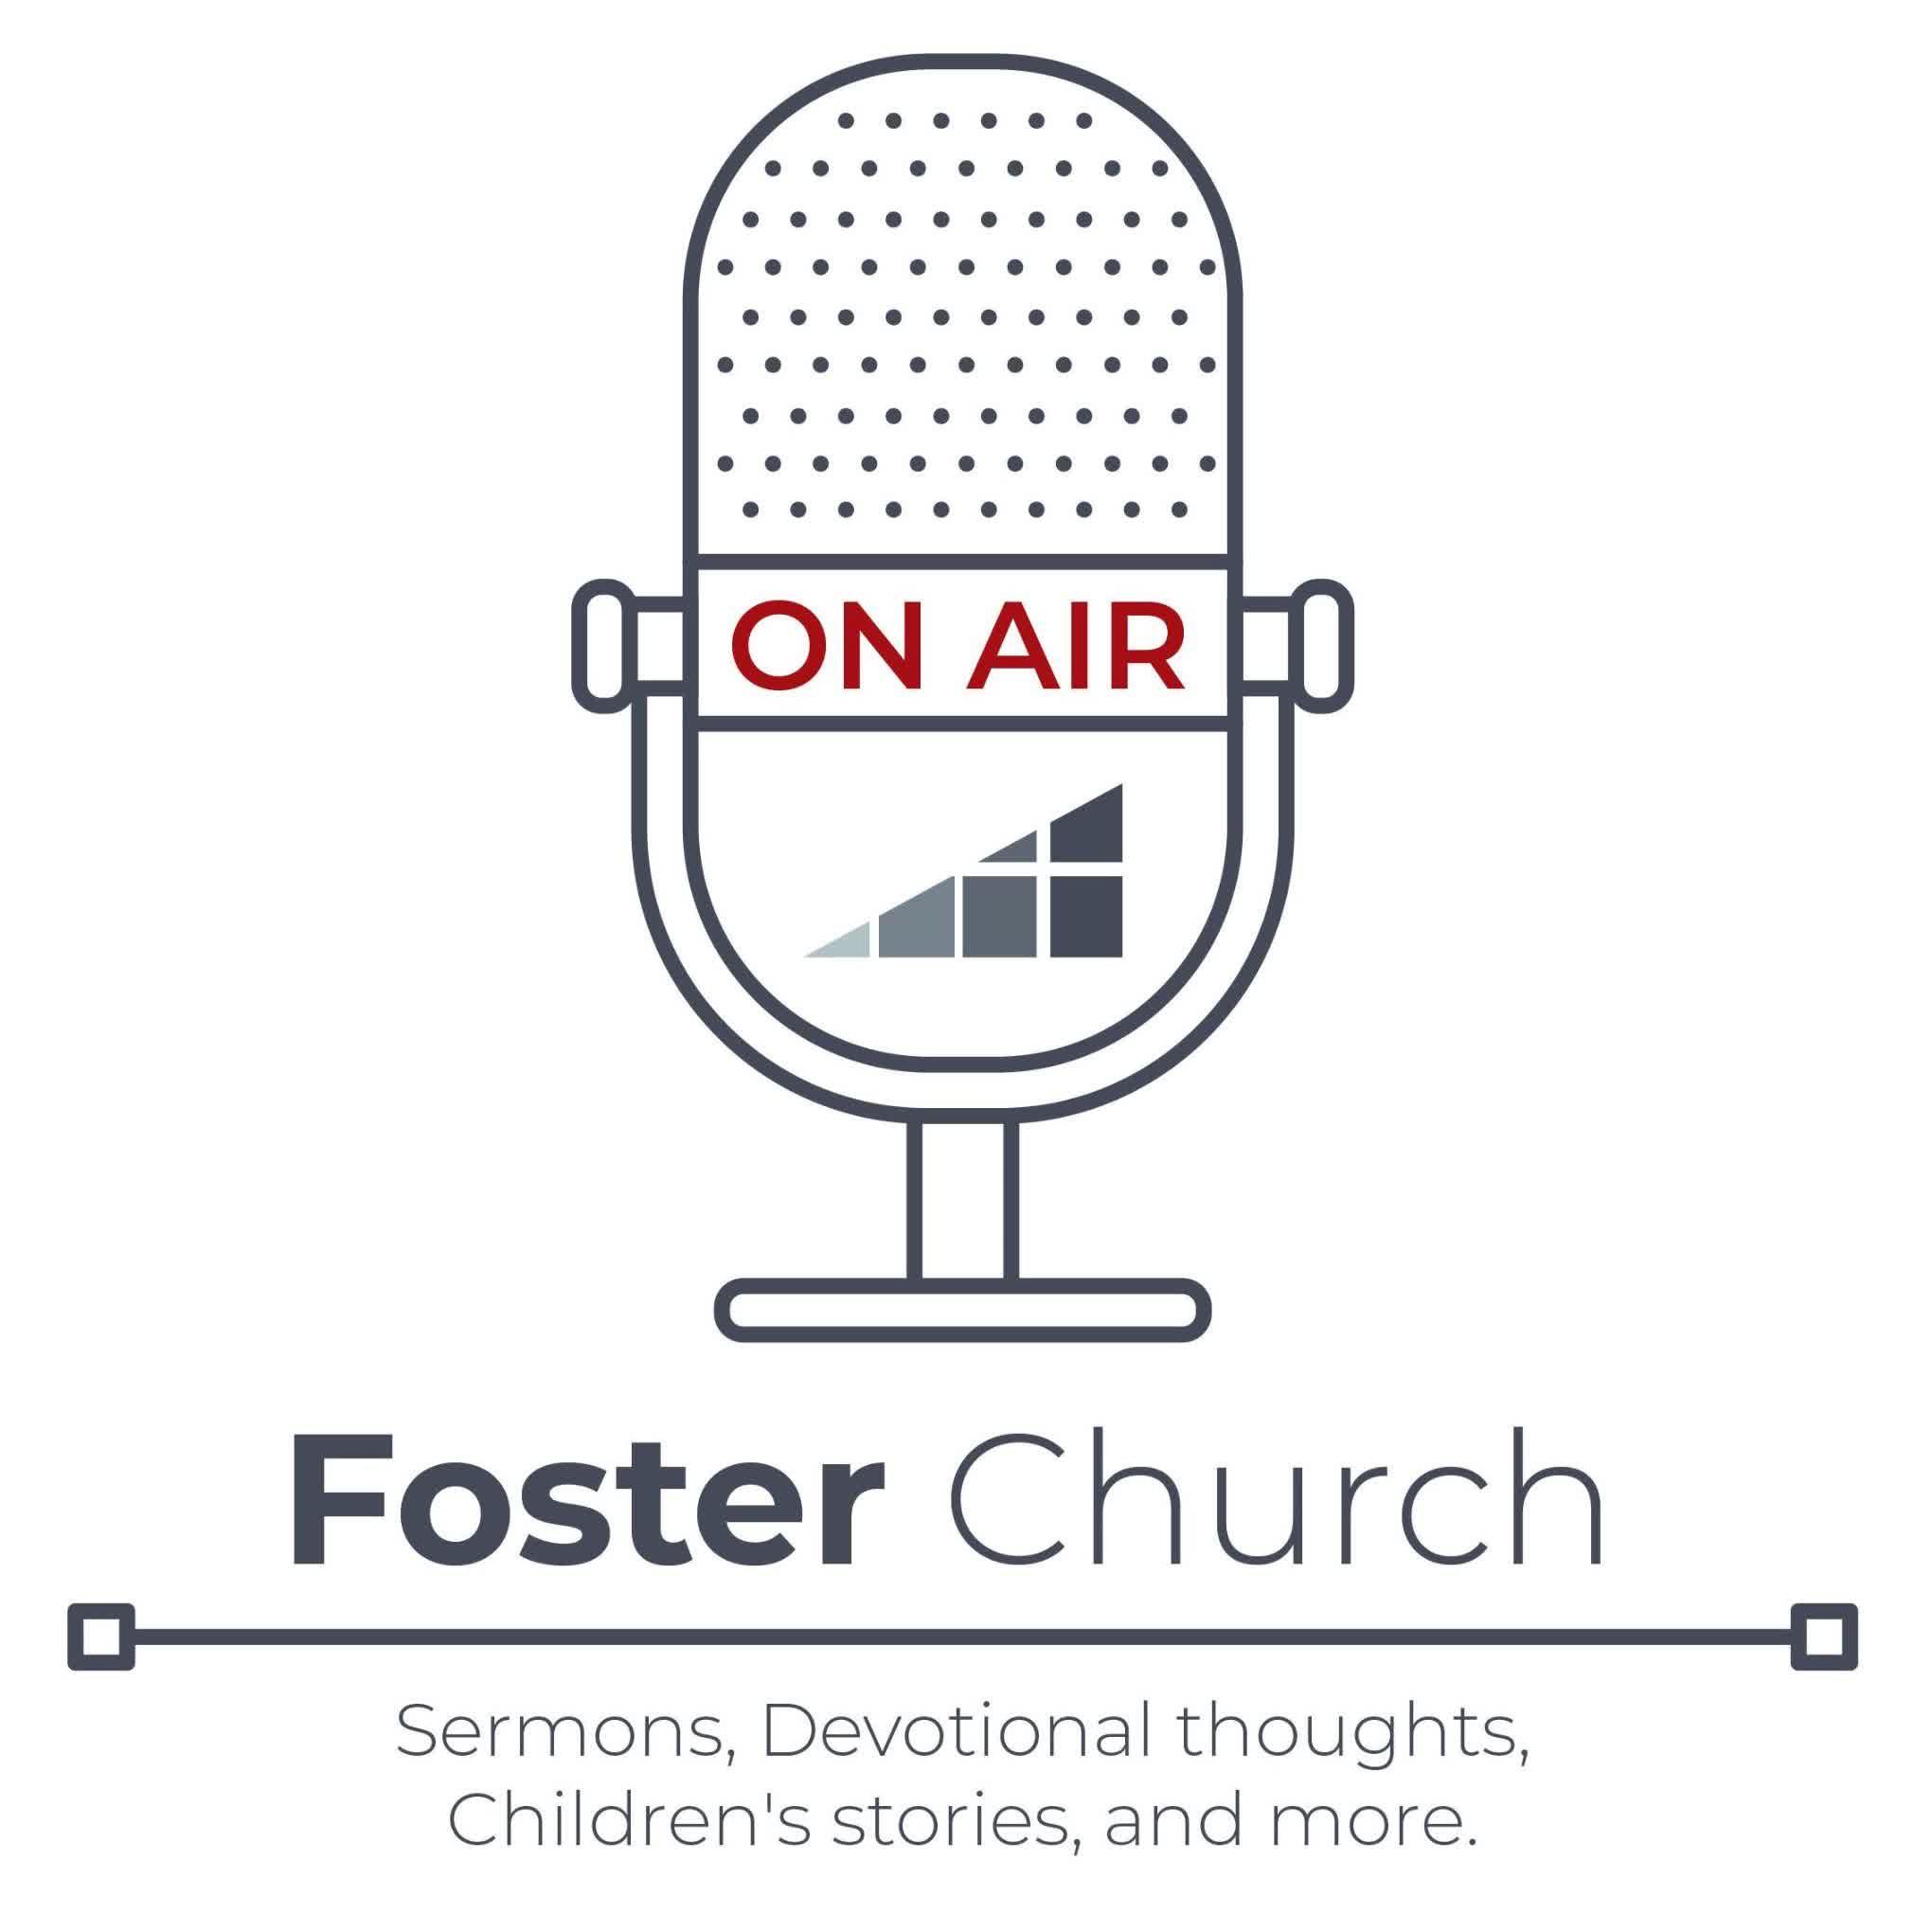 Foster Church